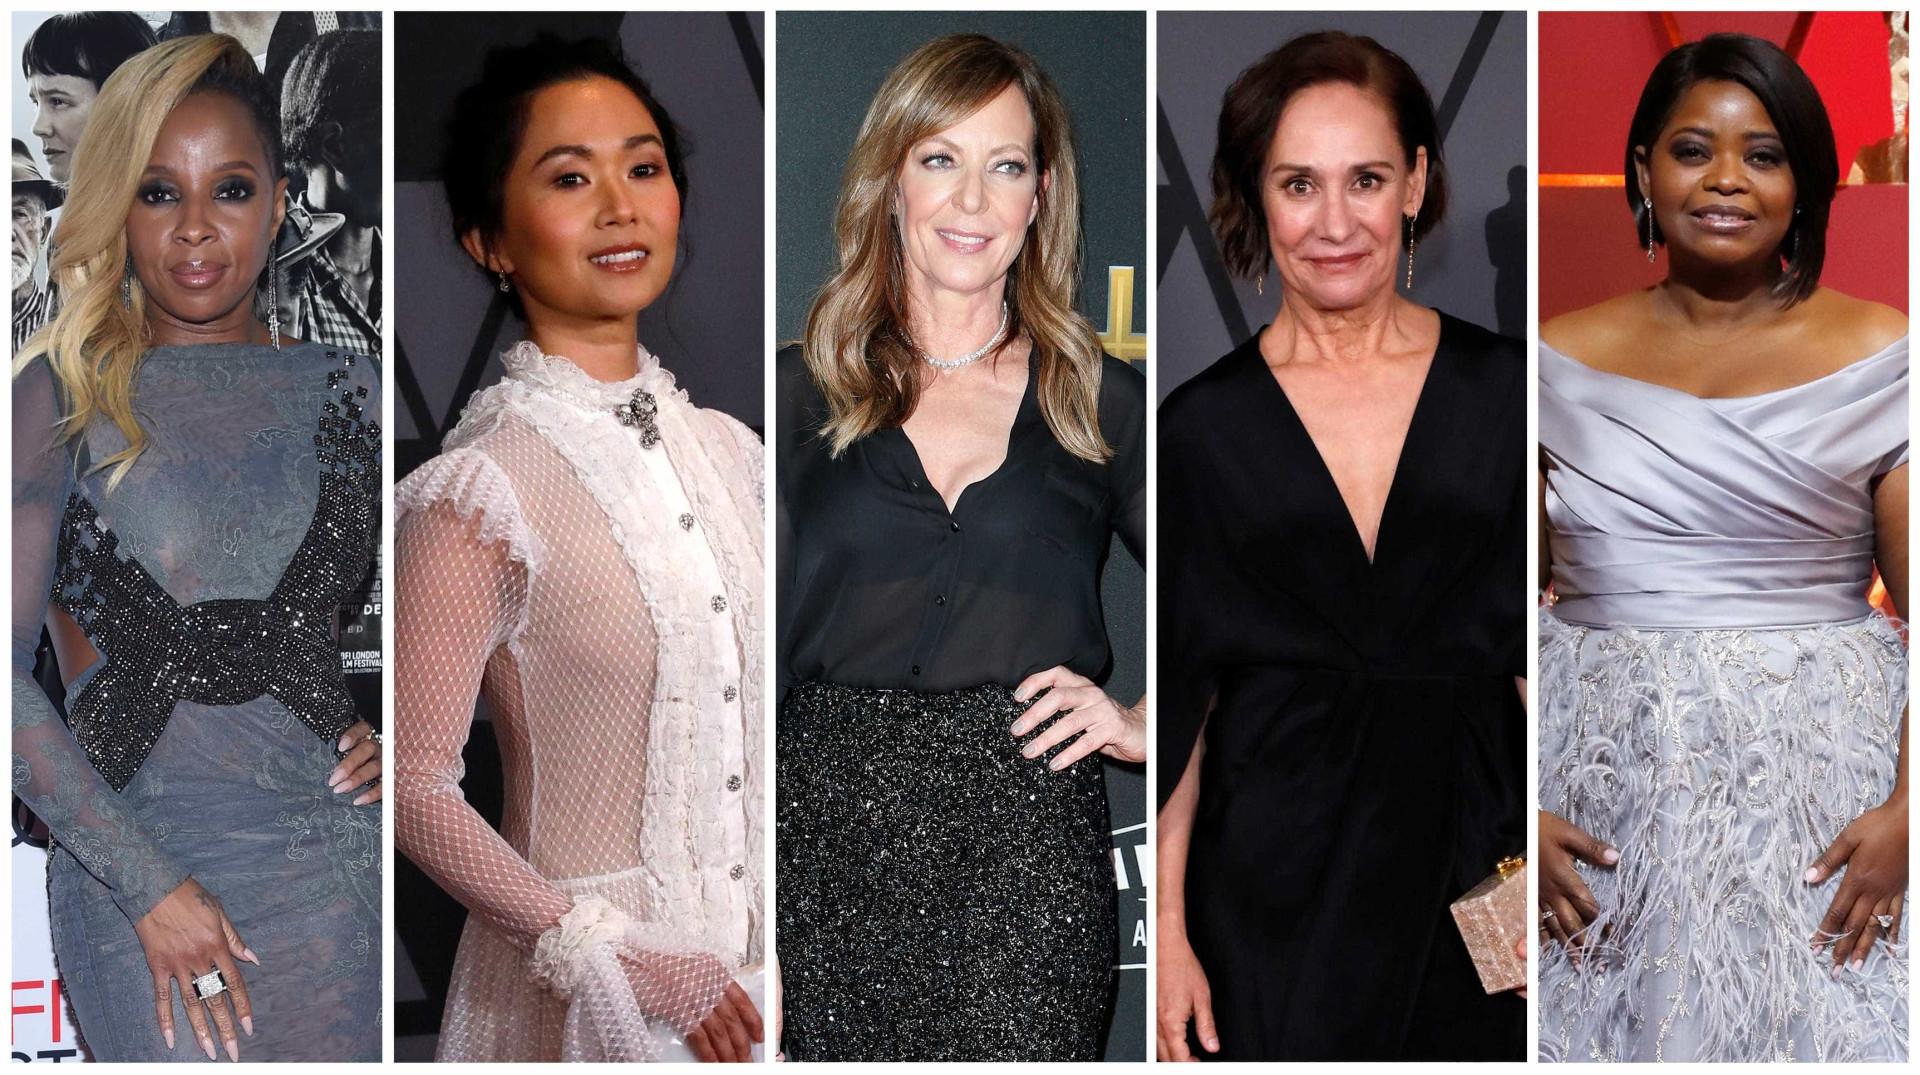 Globos de Ouro 2018. Confira a lista de nomeados